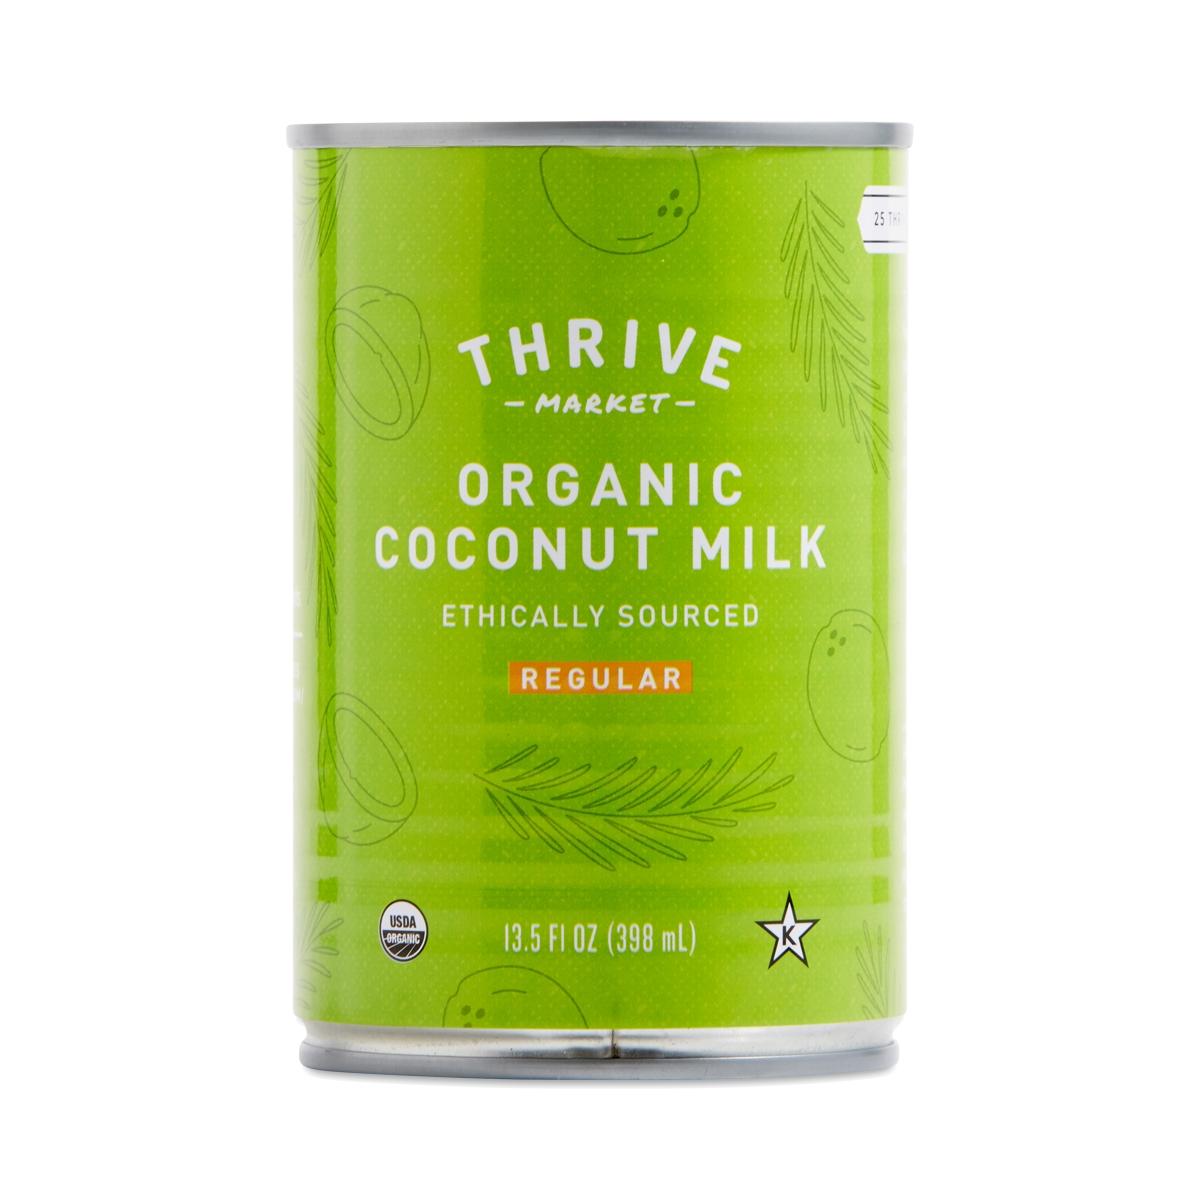 Dress Up your bone broth with Thrive Market Organic Coconut Milk - Regular 13.5 oz can